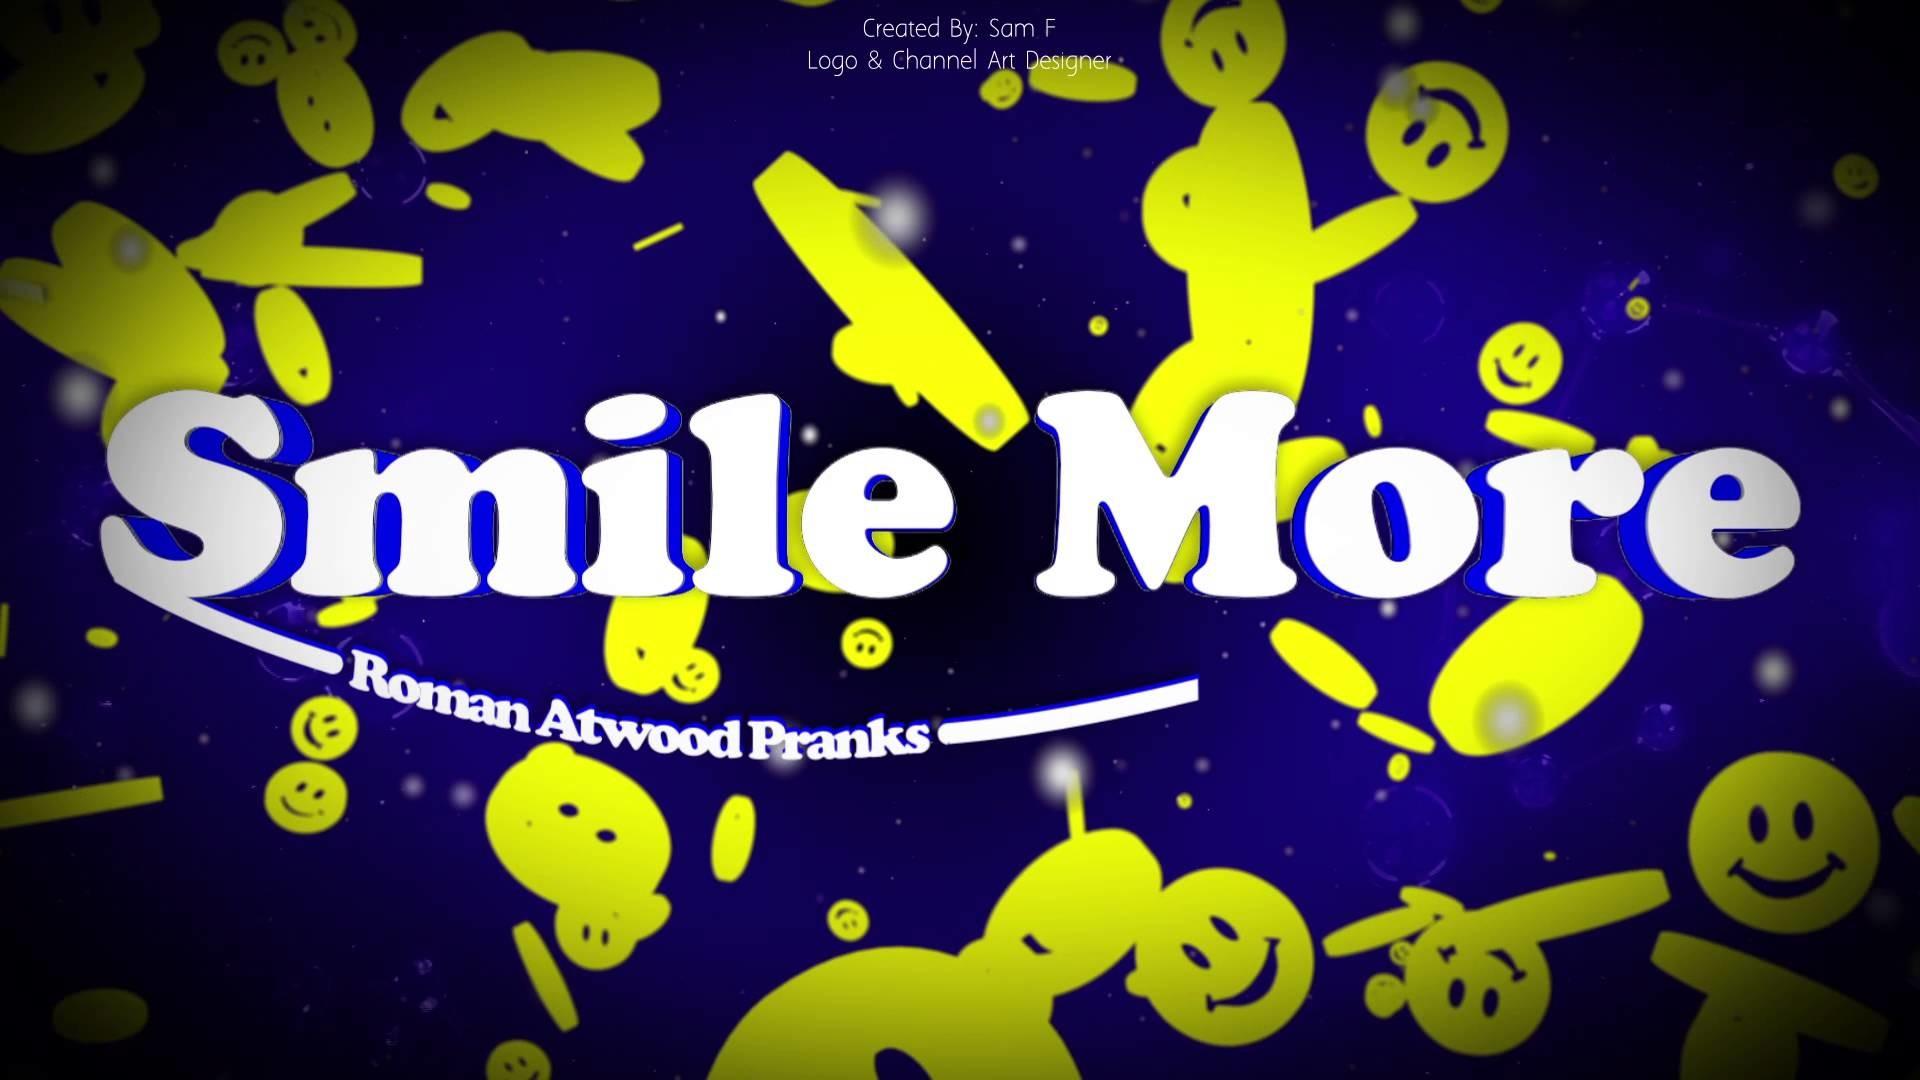 Smile More Wallpaper, Live Smile More Wallpapers, RCC517 Smile .